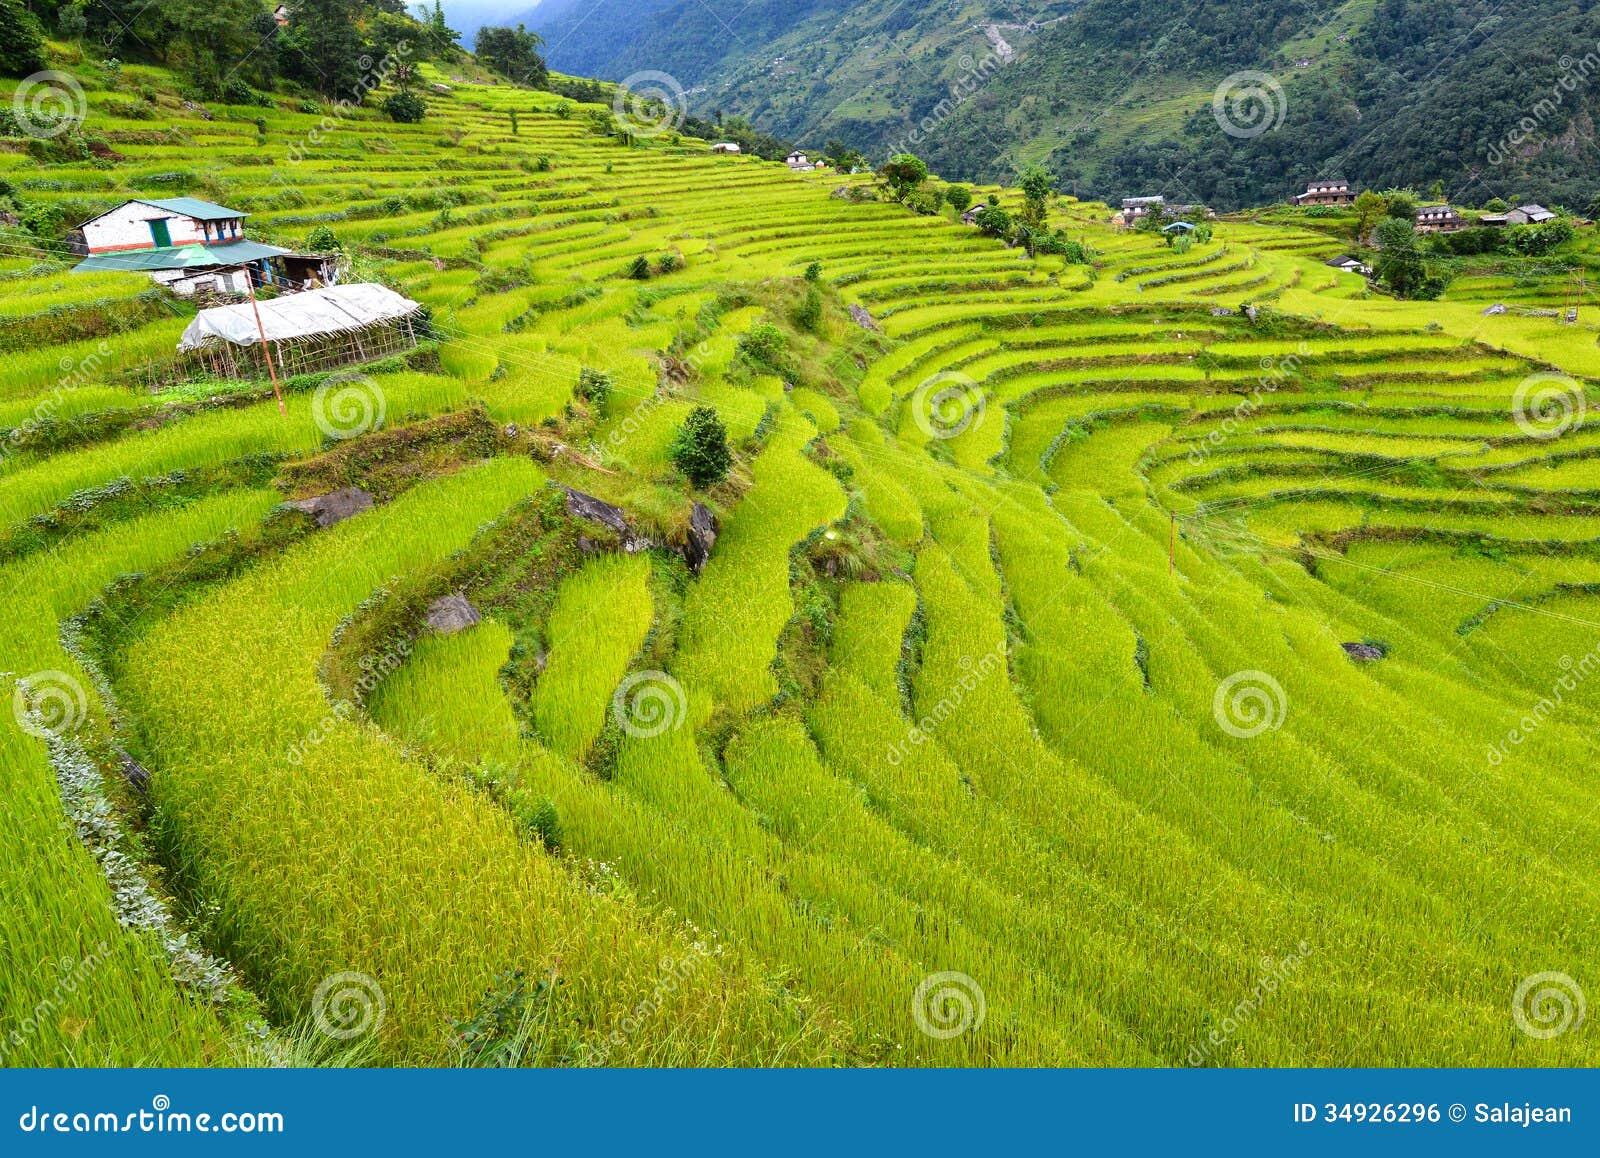 Terraced Rice Fields Himalayas Nepal Royalty Free Stock